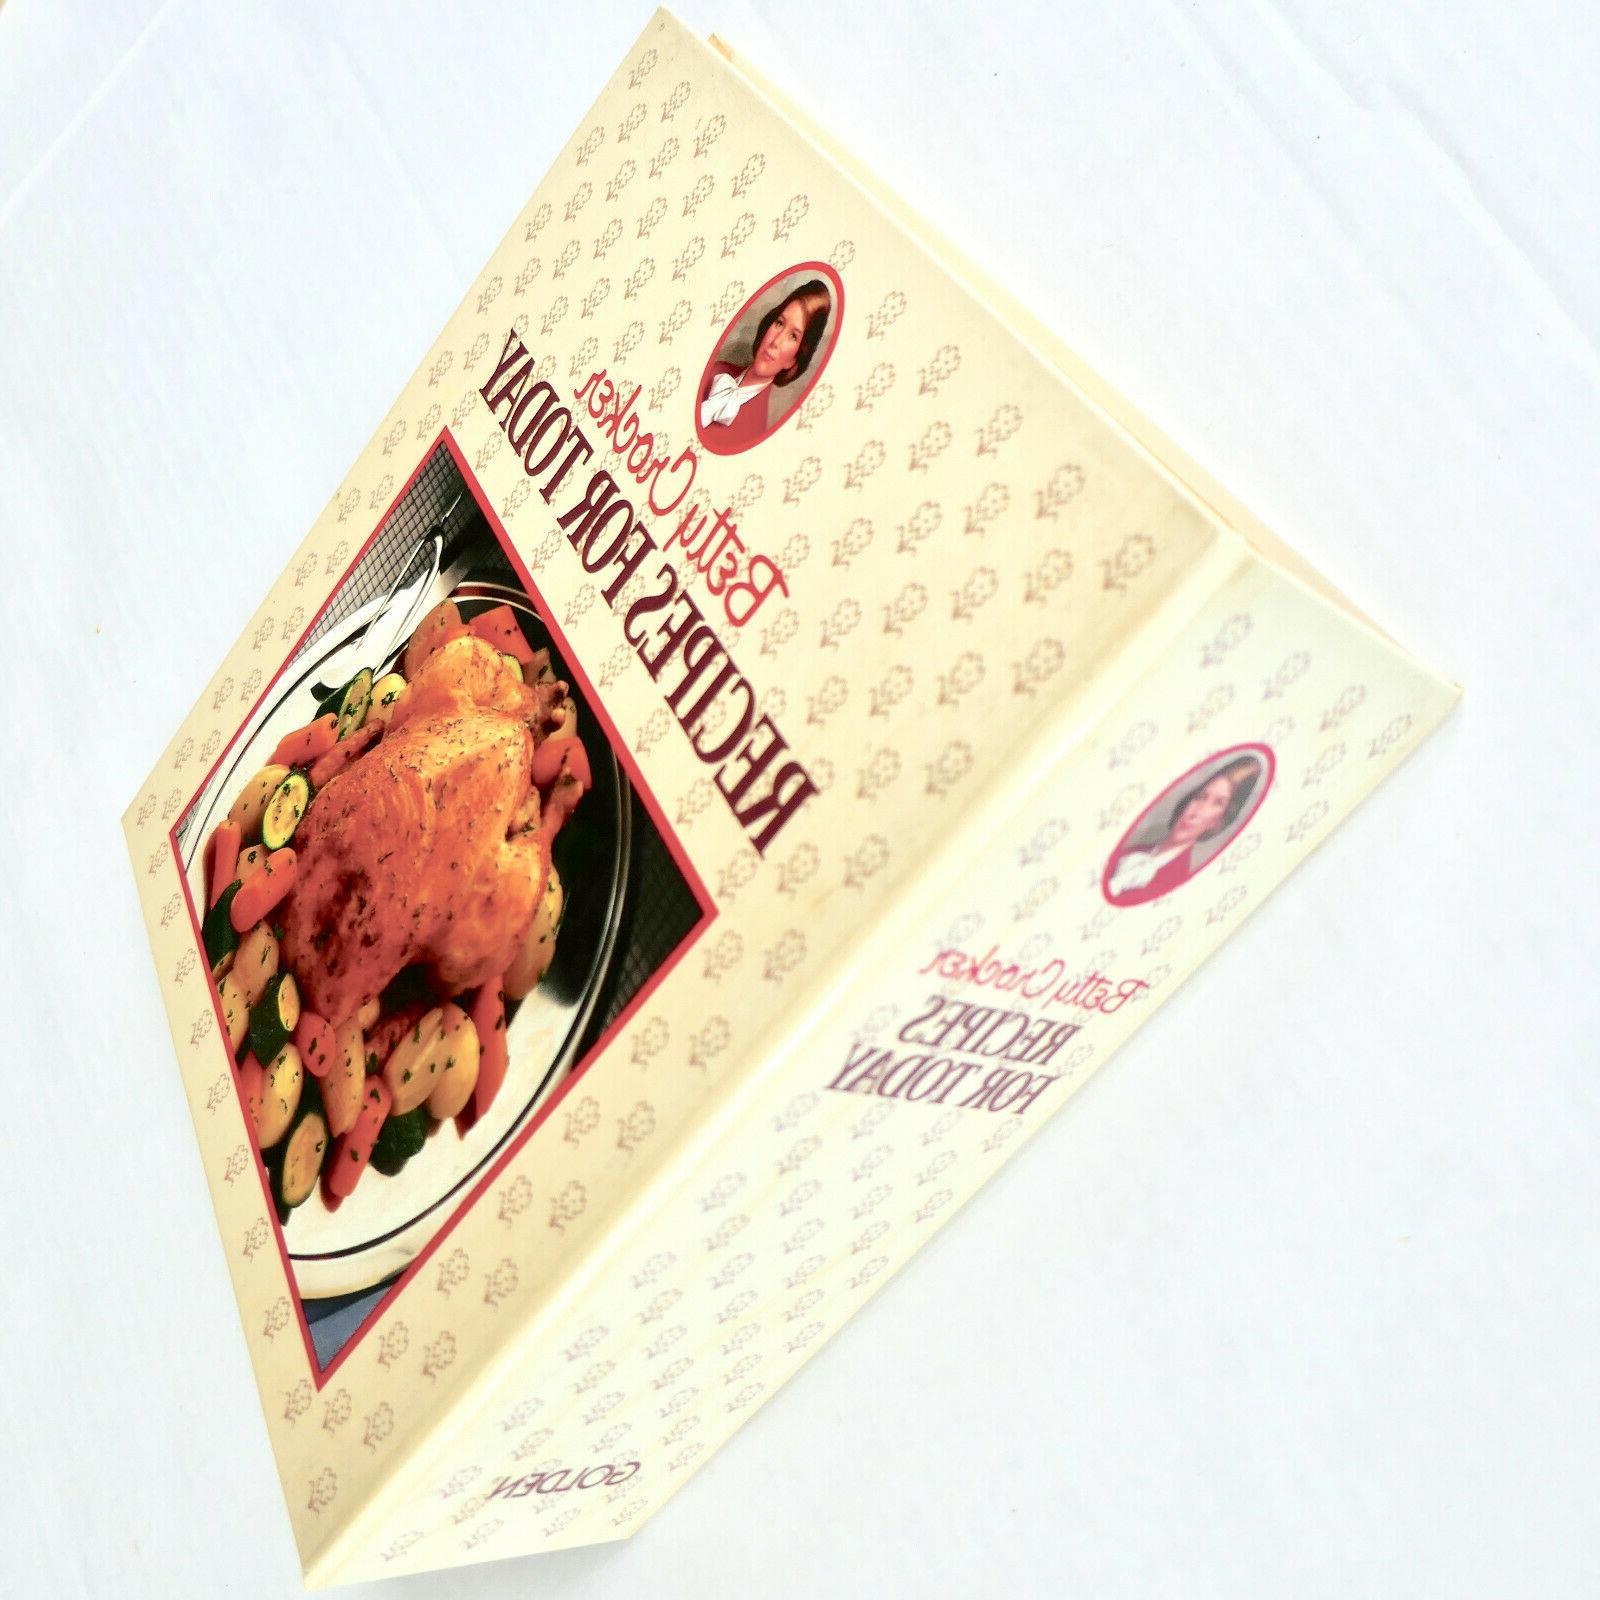 betty crocker recipes for today 1986 2